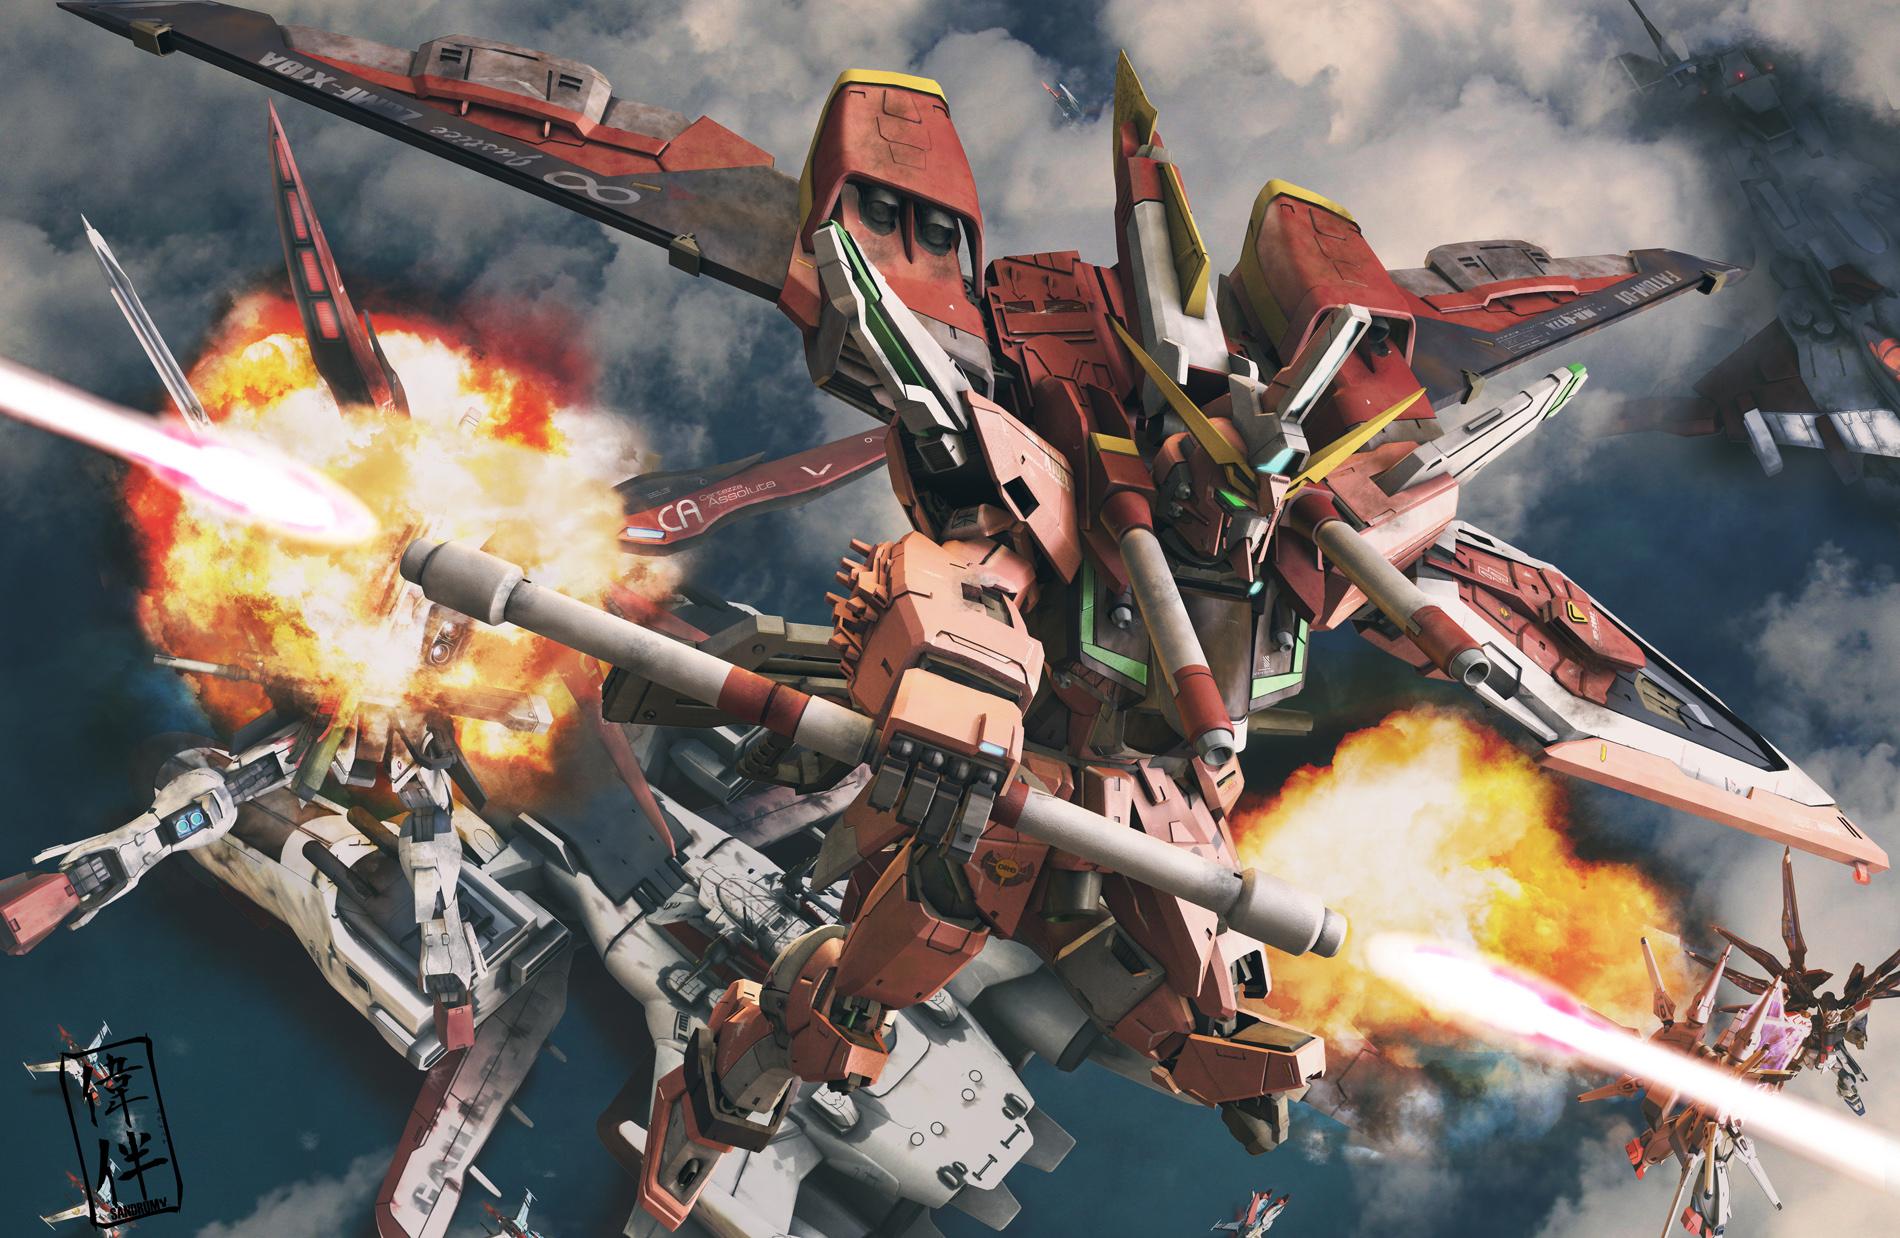 Anime Gundam Wallpaper 1900x1238 Anime Gundam 1900x1238